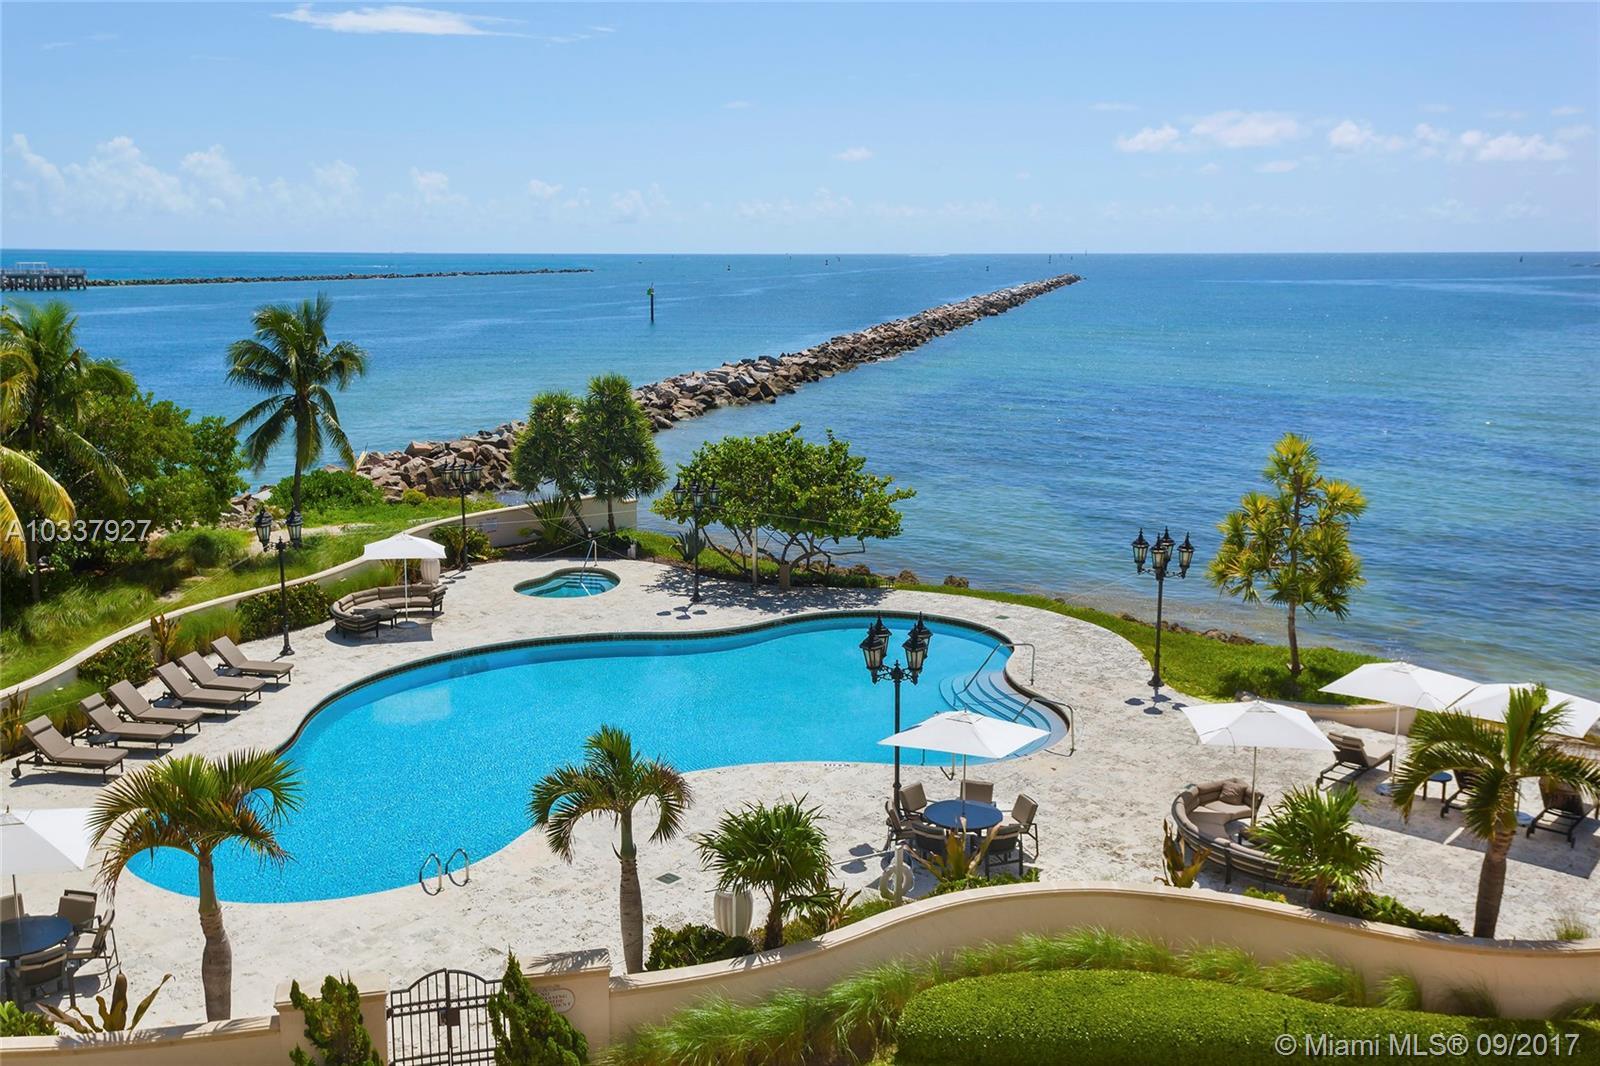 7233 fisher island dr 7233 miami beach fl 33109 aria for 7233 parkside villas drive